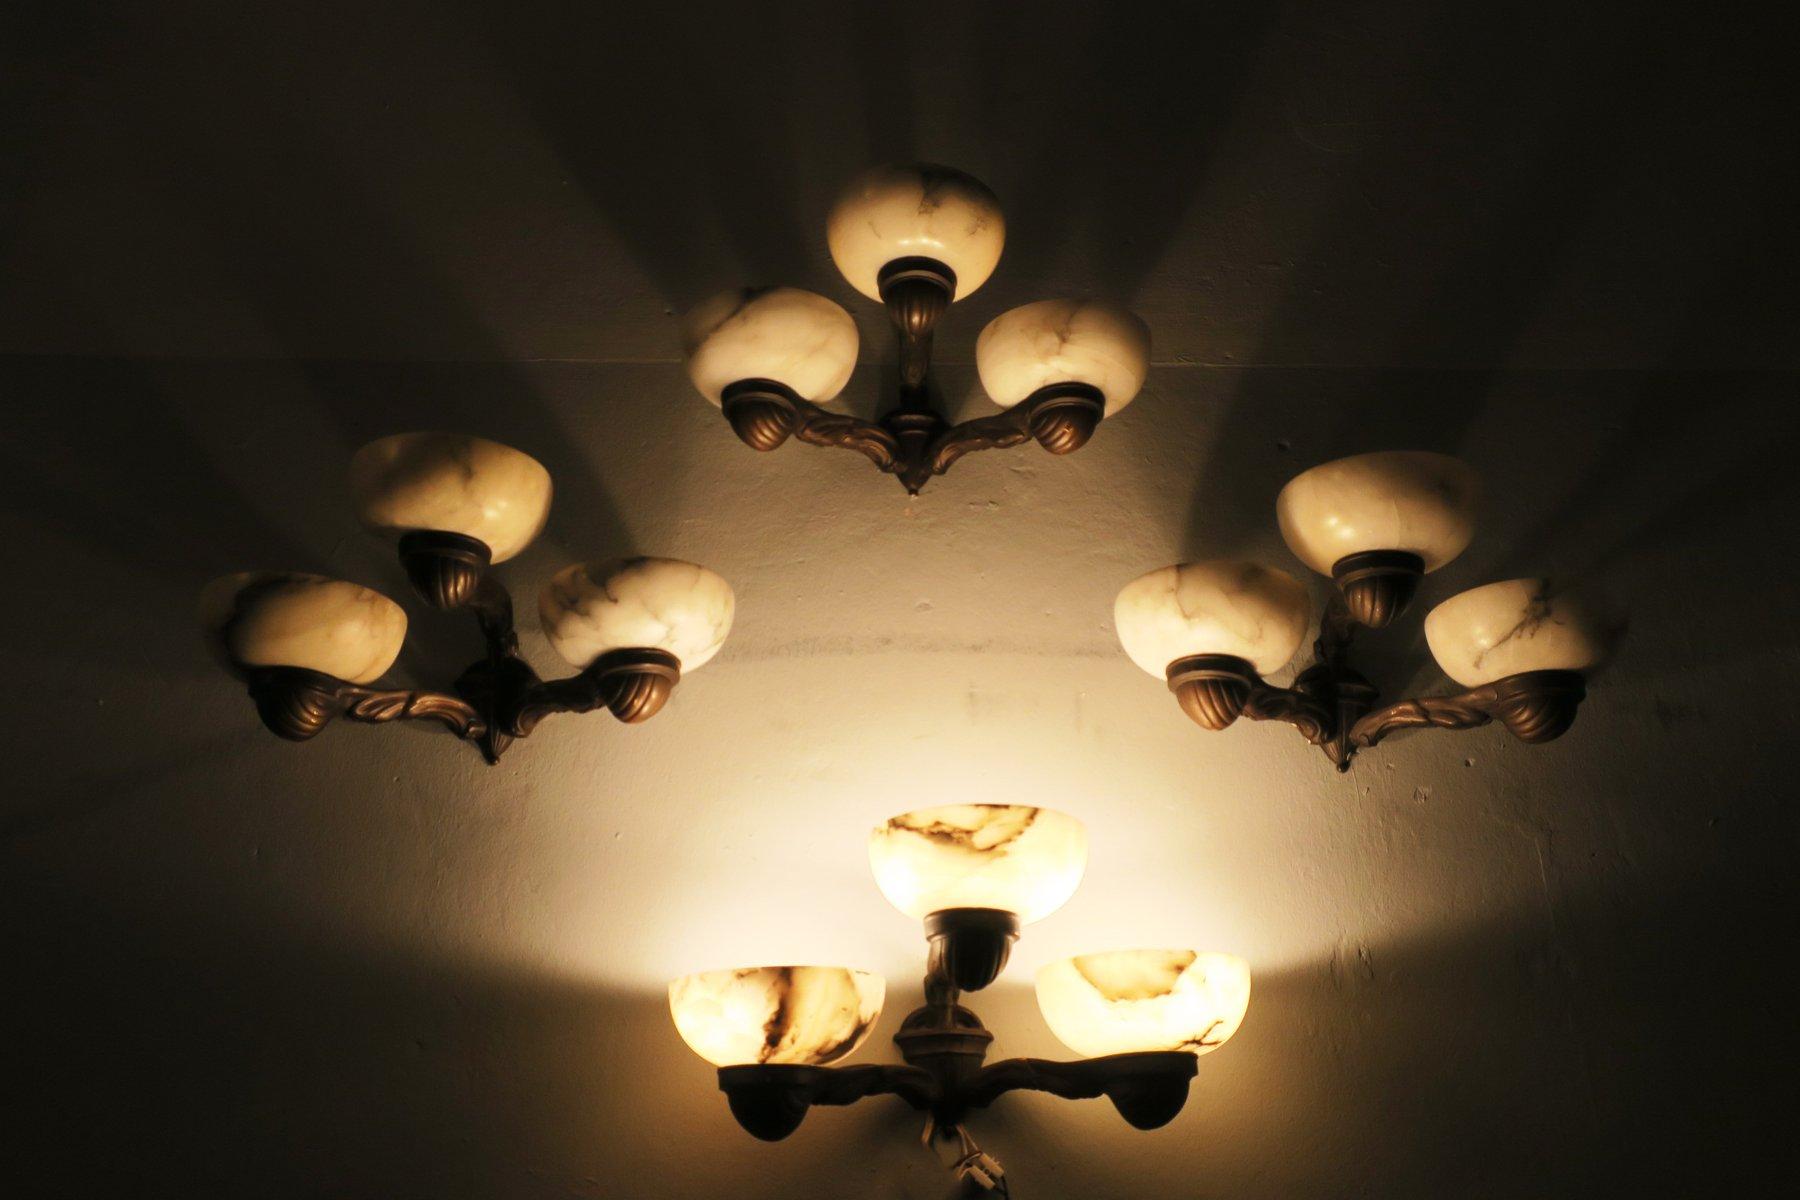 antike alabaster bronze wandlampen 4er set bei pamono kaufen. Black Bedroom Furniture Sets. Home Design Ideas